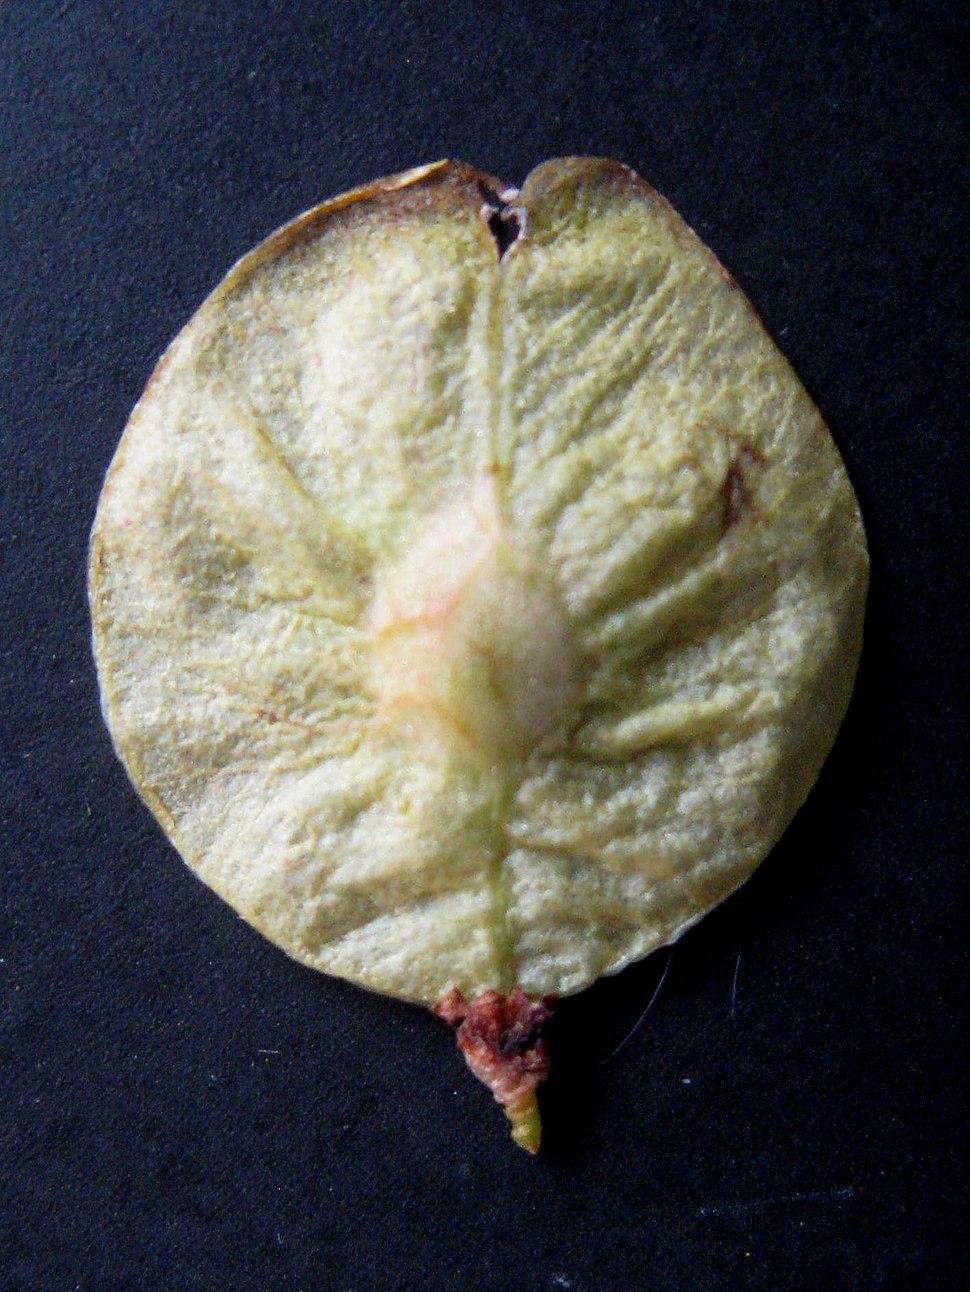 Laciniata samara